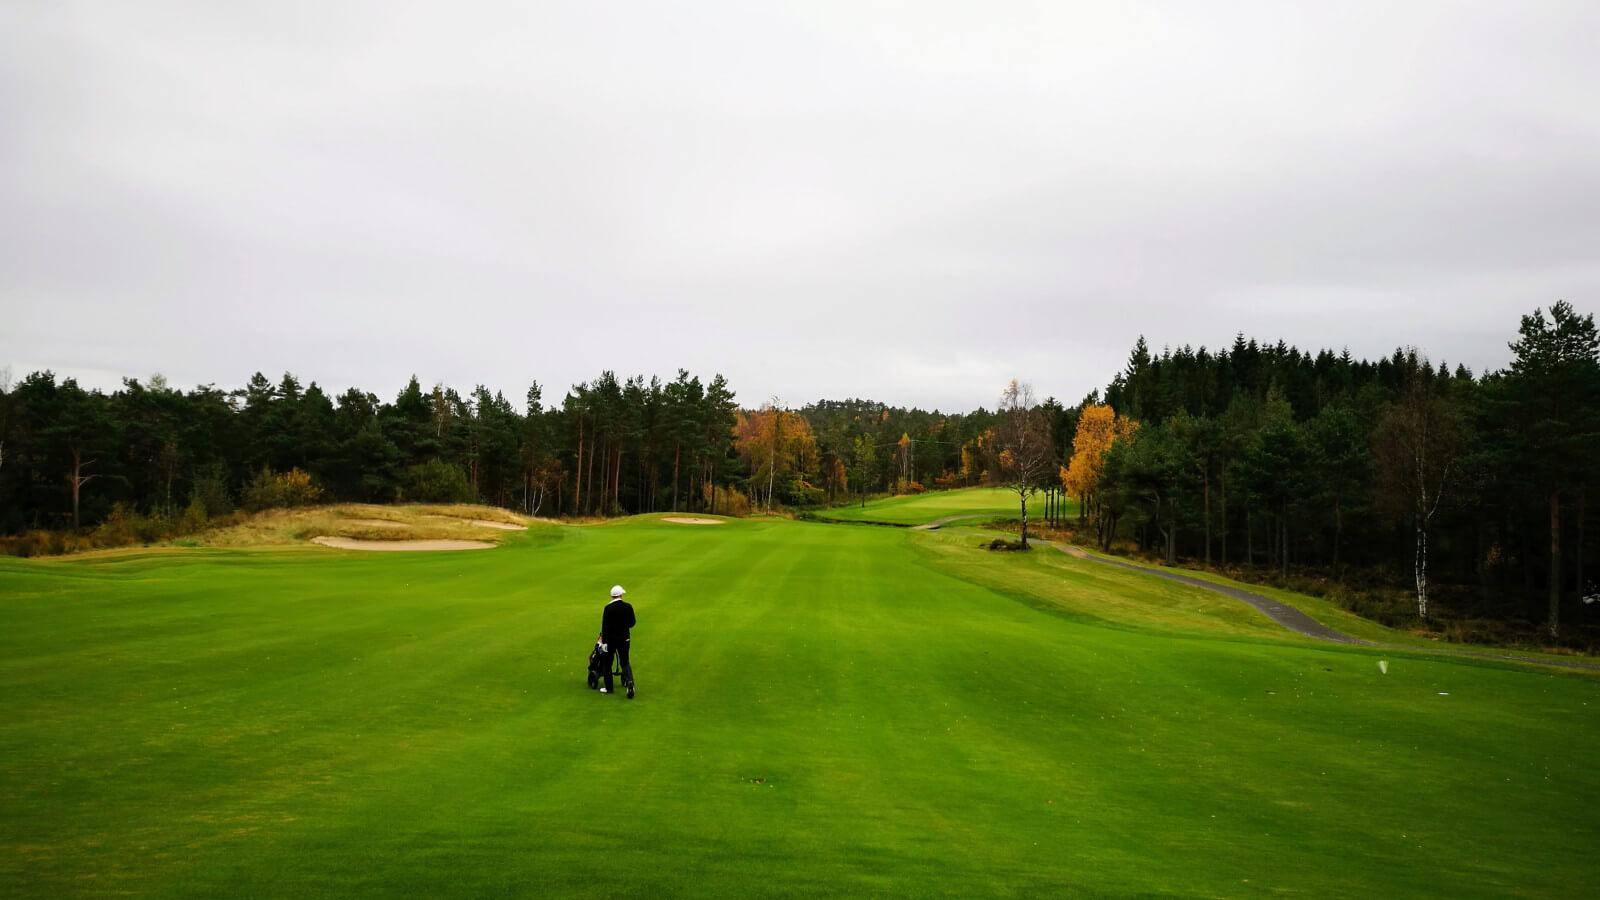 Hull 13, Kragerø Golfklubb